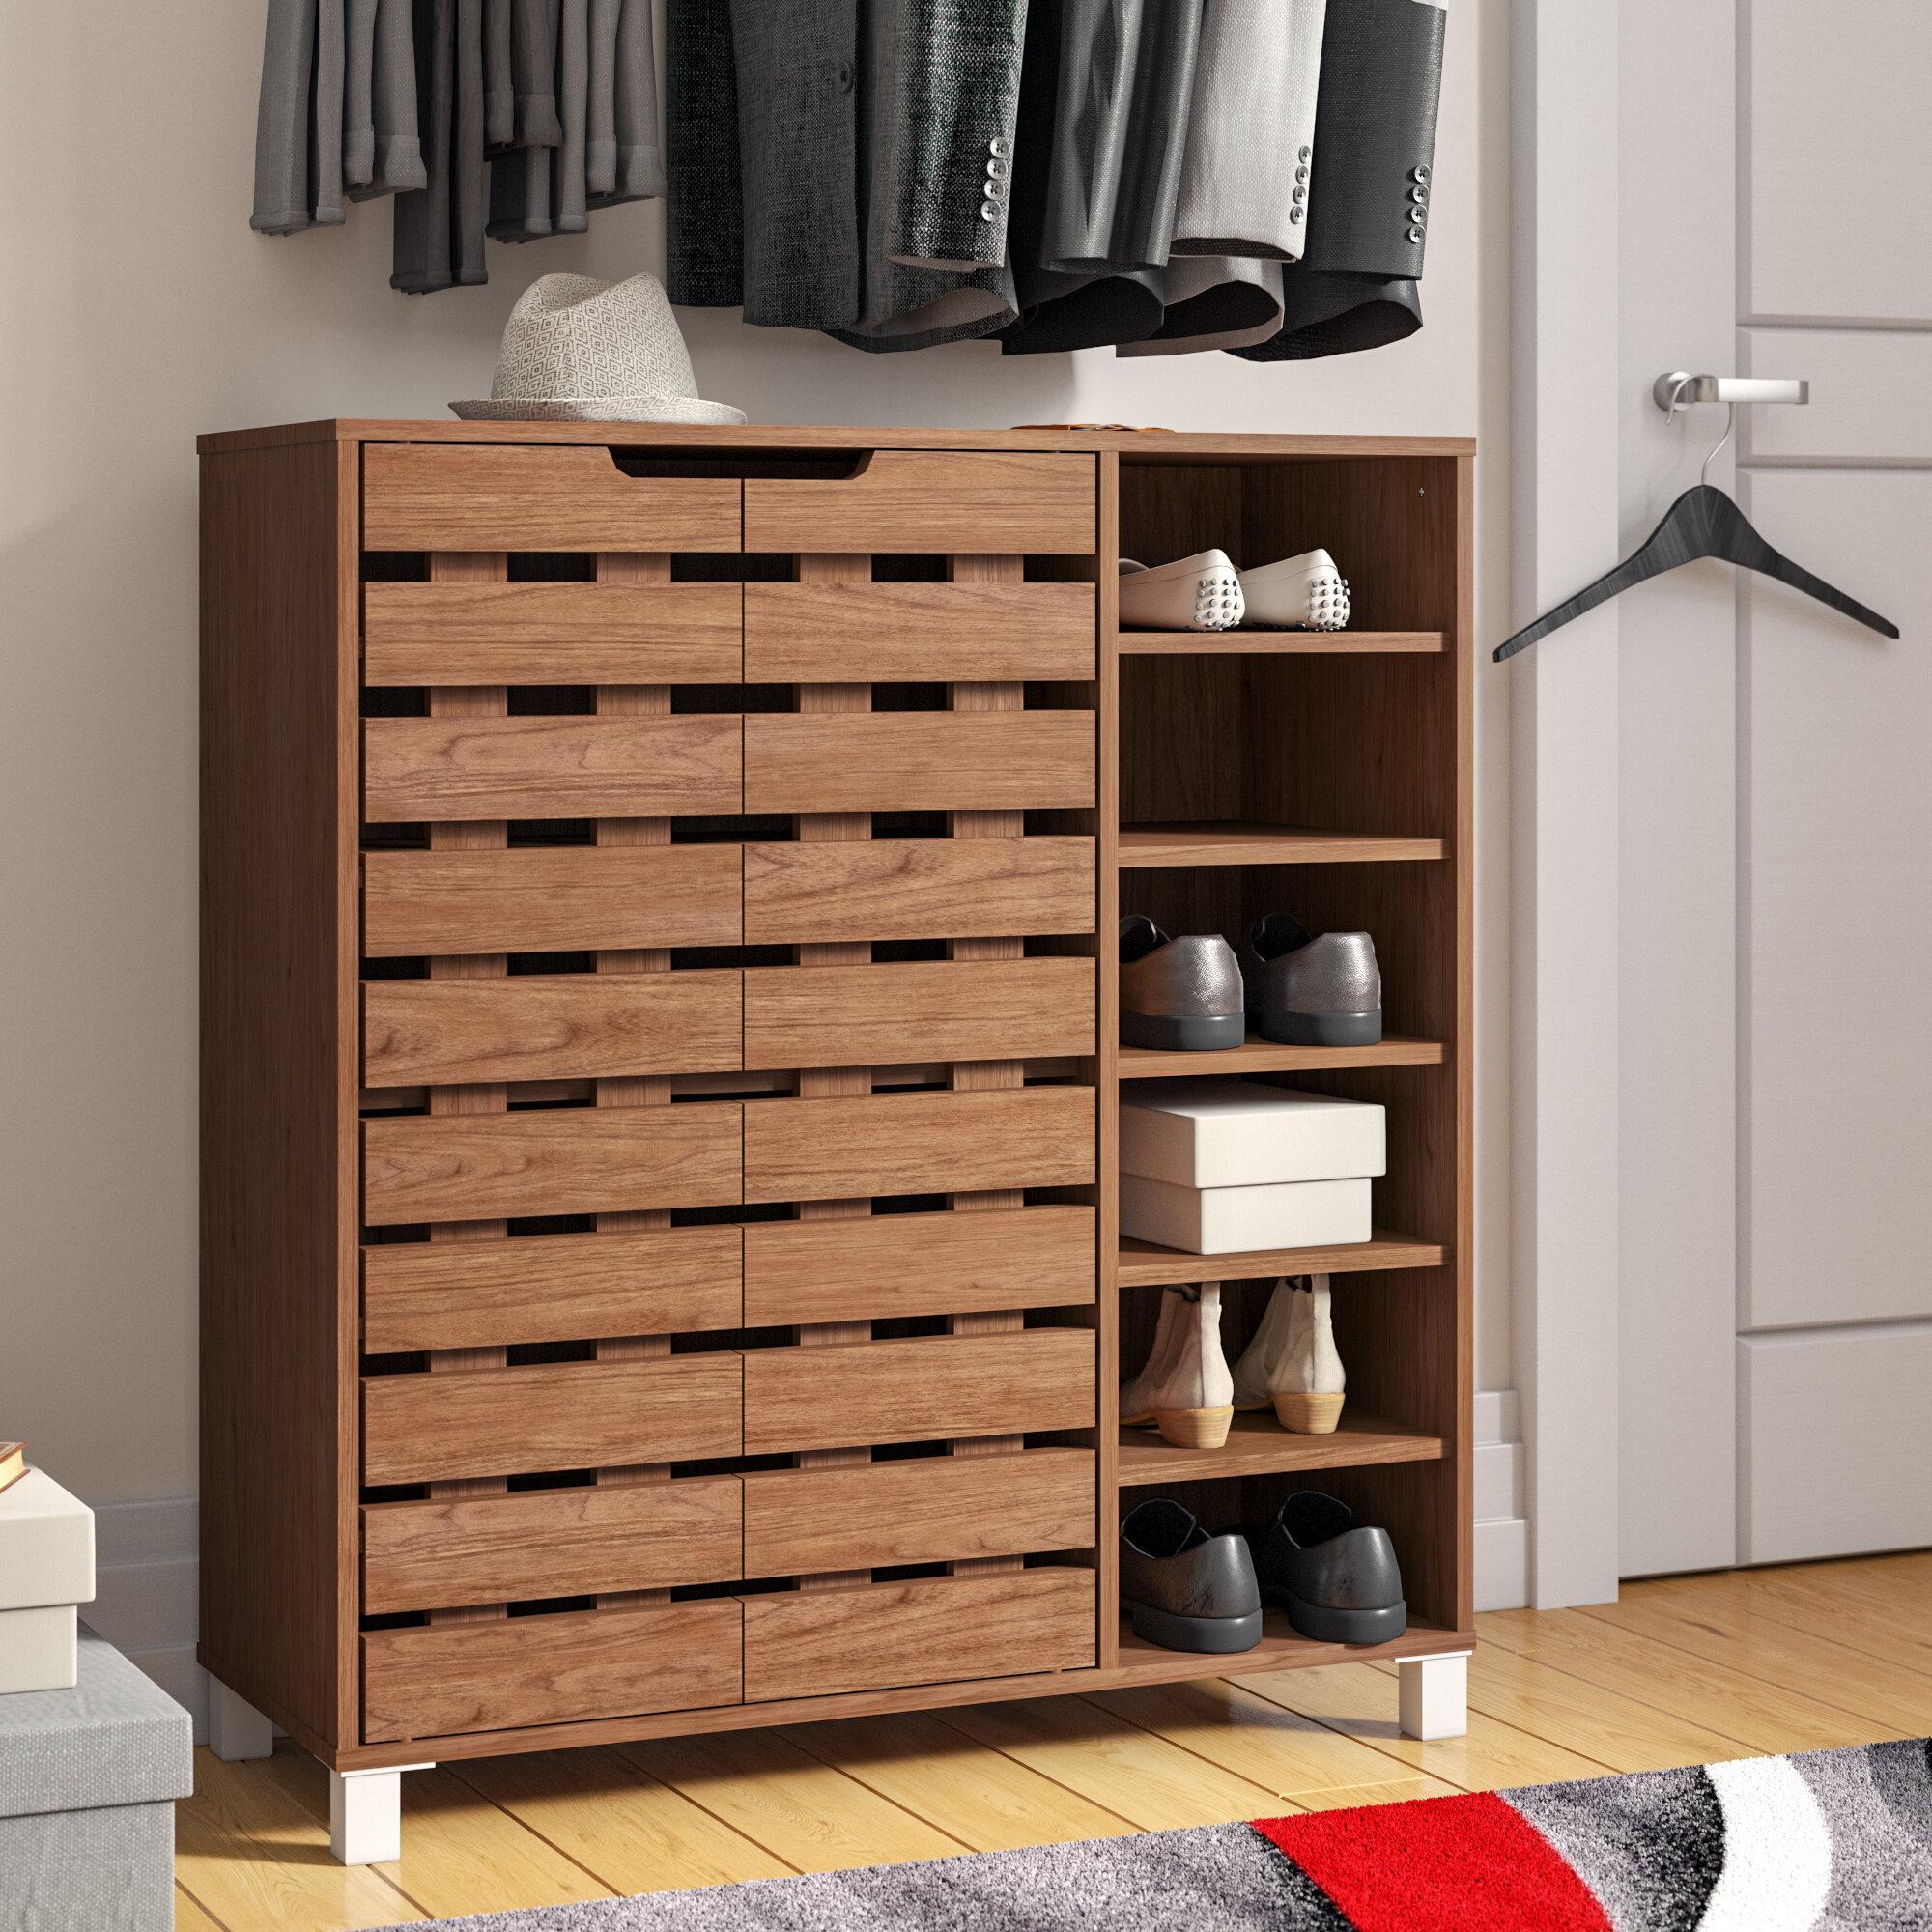 Zipcode Design 18 Pair Shoe Storage Cabinet Reviews Wayfair